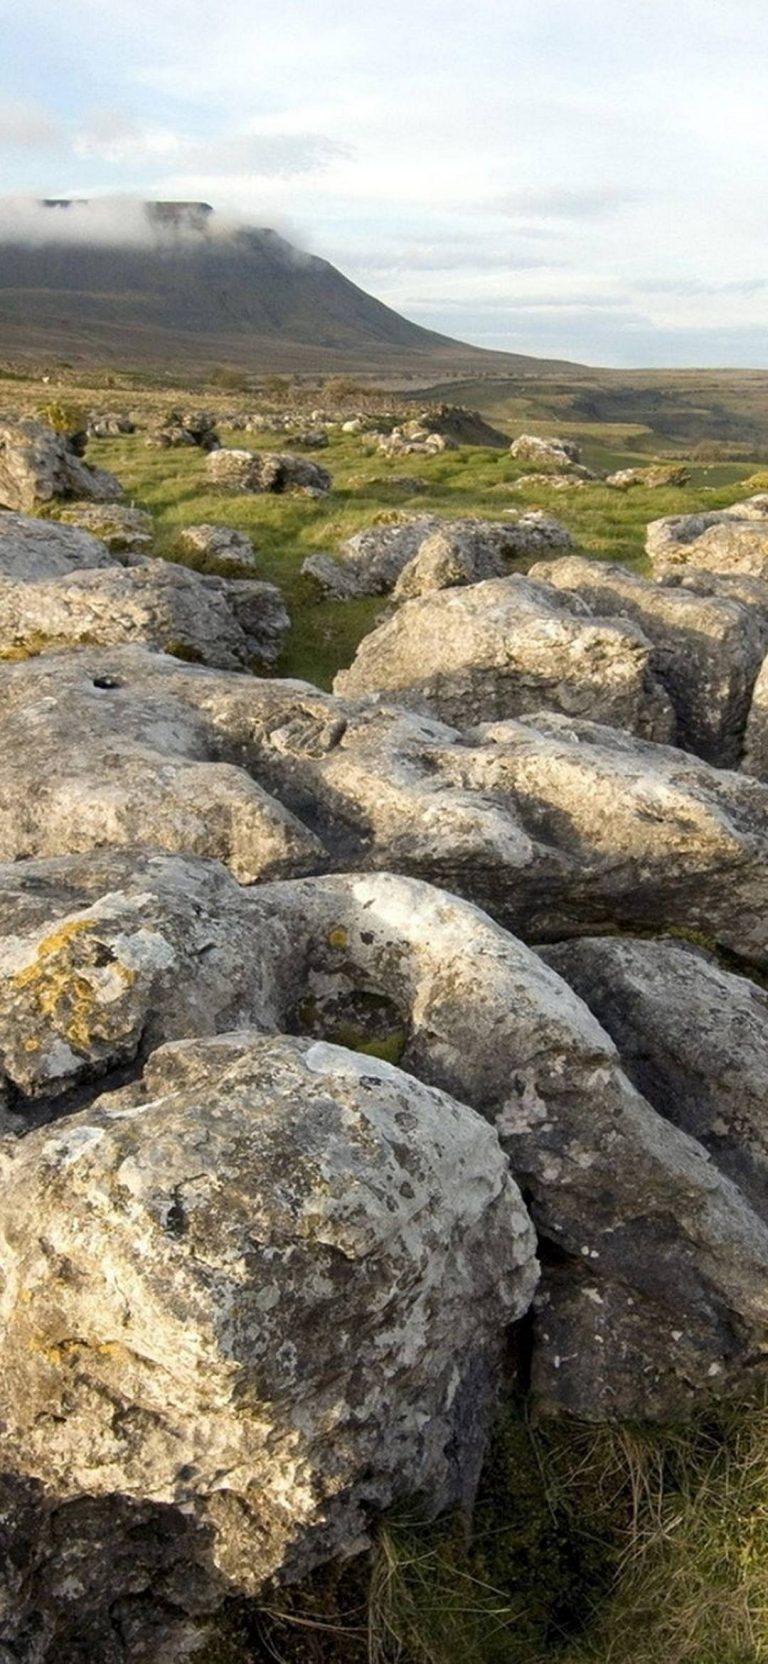 Stones Grass Sky 1080x2340 768x1664